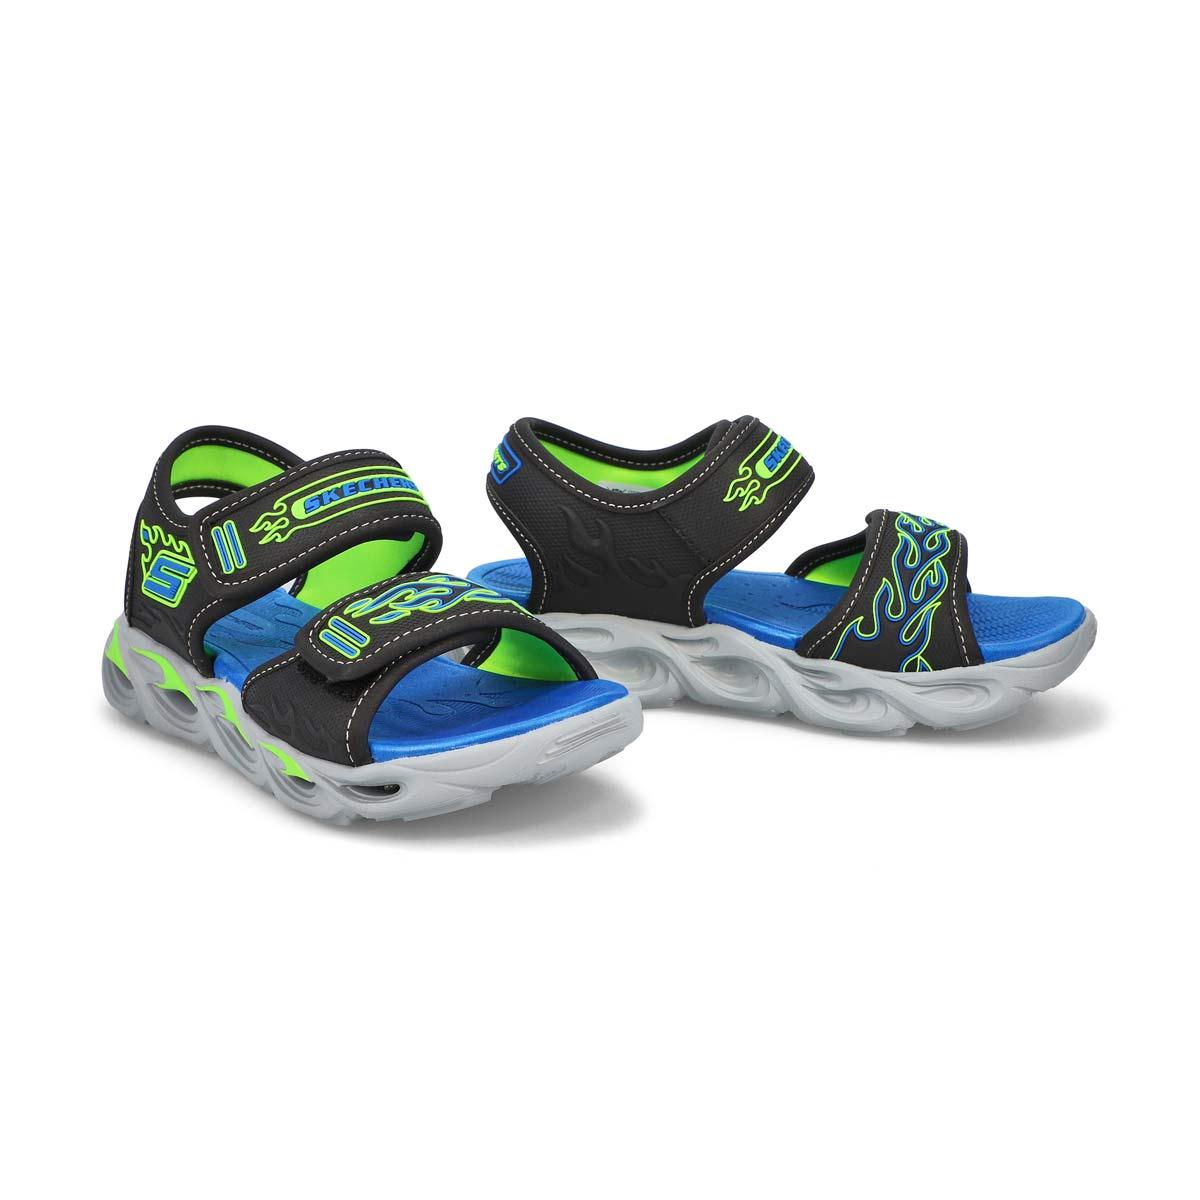 Boys' Thermo-Splash Sandal - Black/Blue/Lime